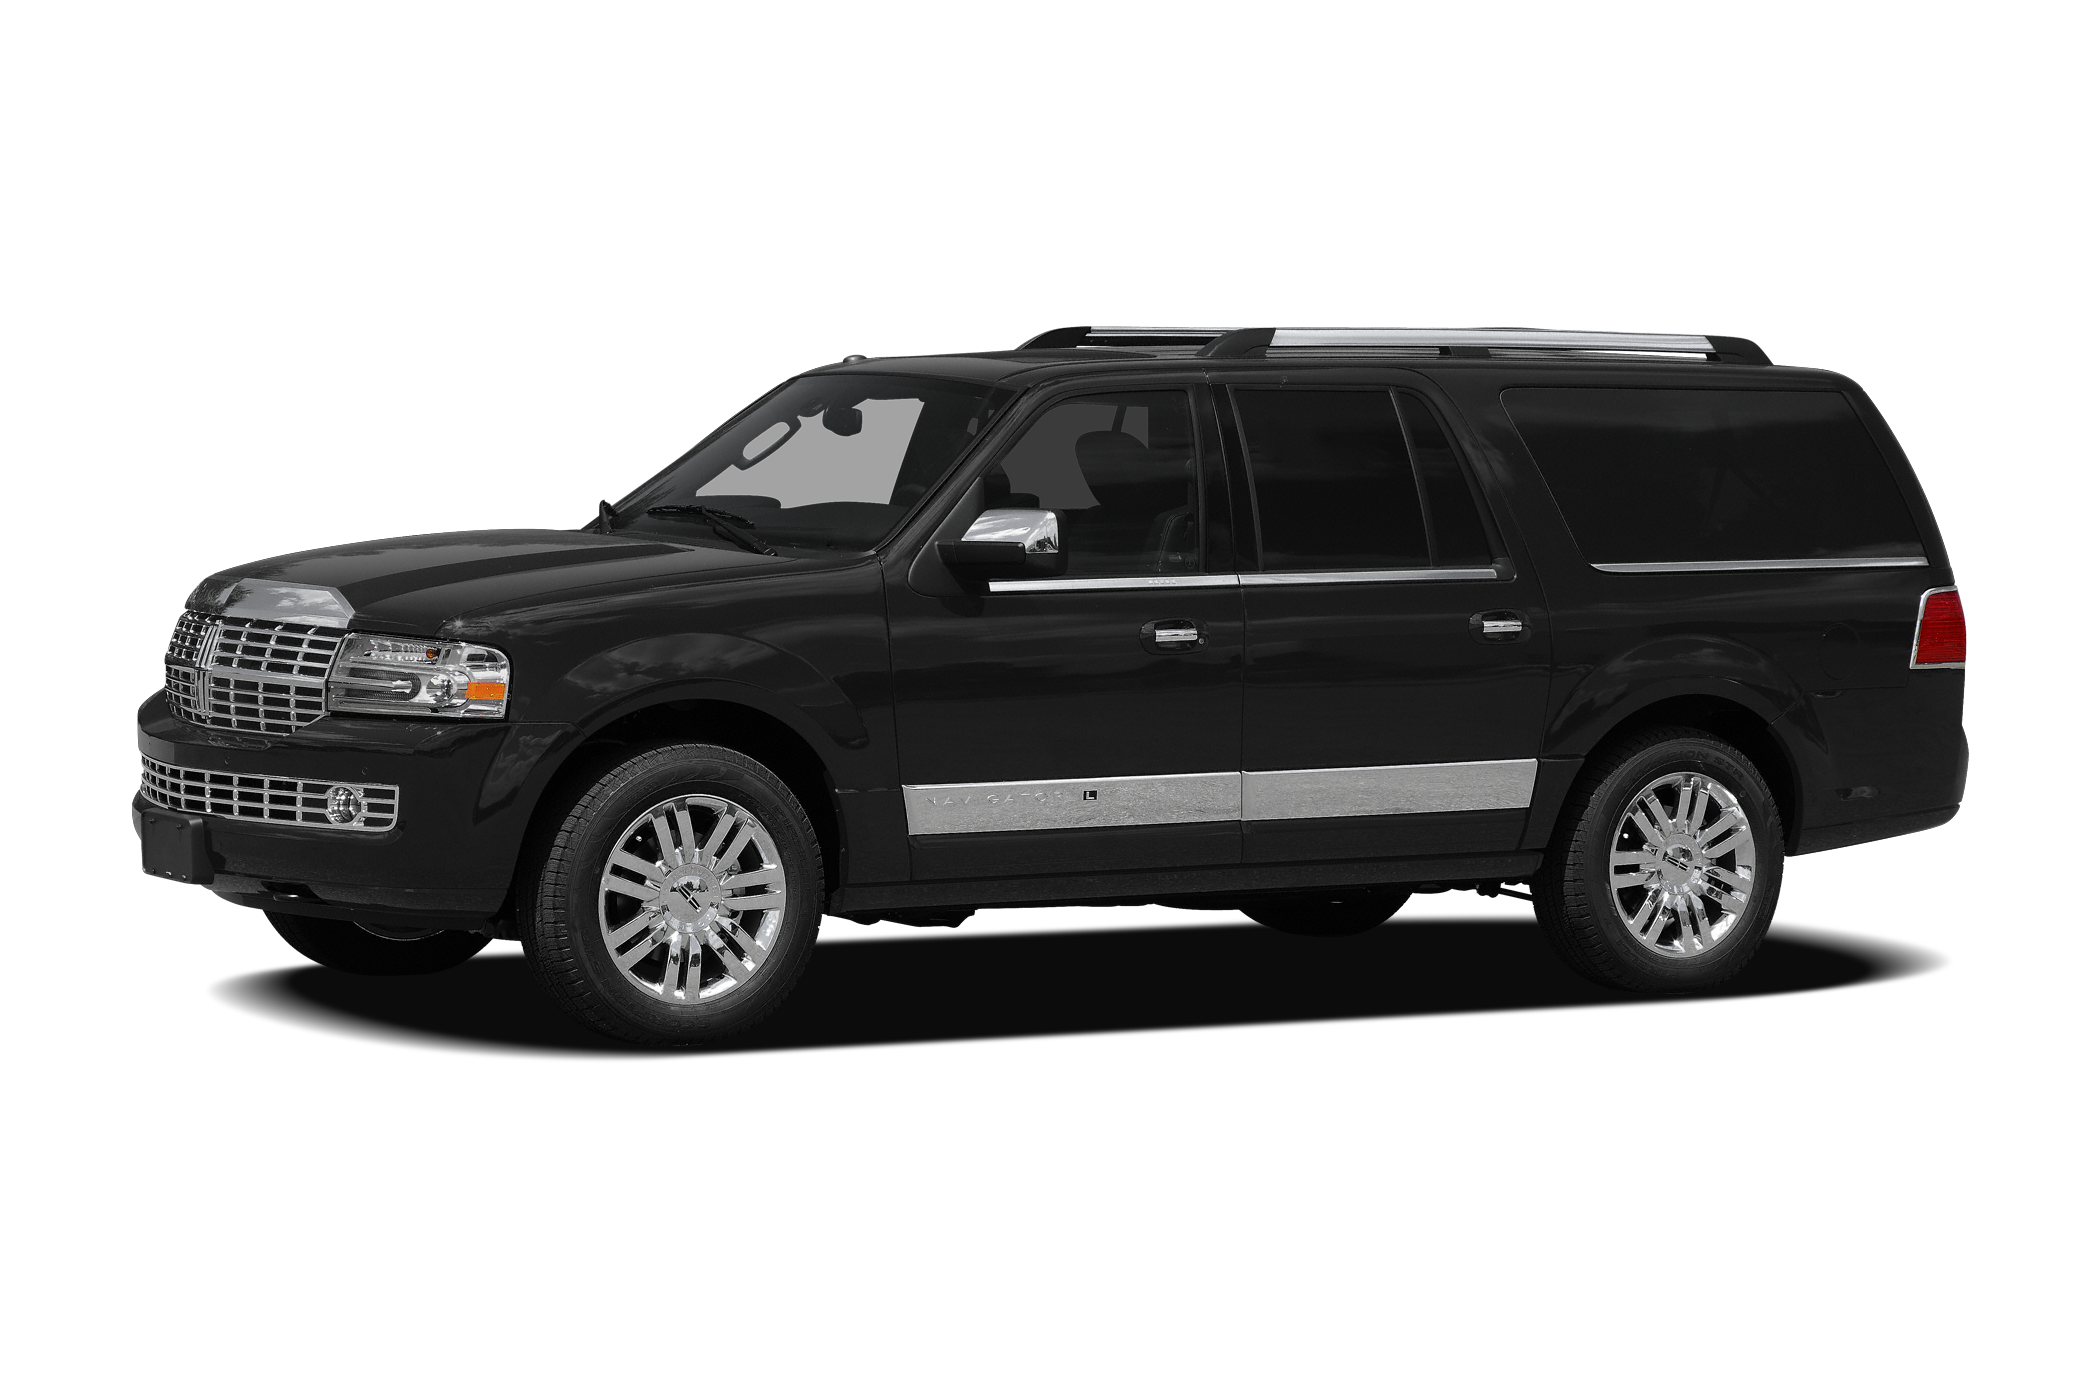 Used 2008 Lincoln Navigator L For Sale | West Milford NJ